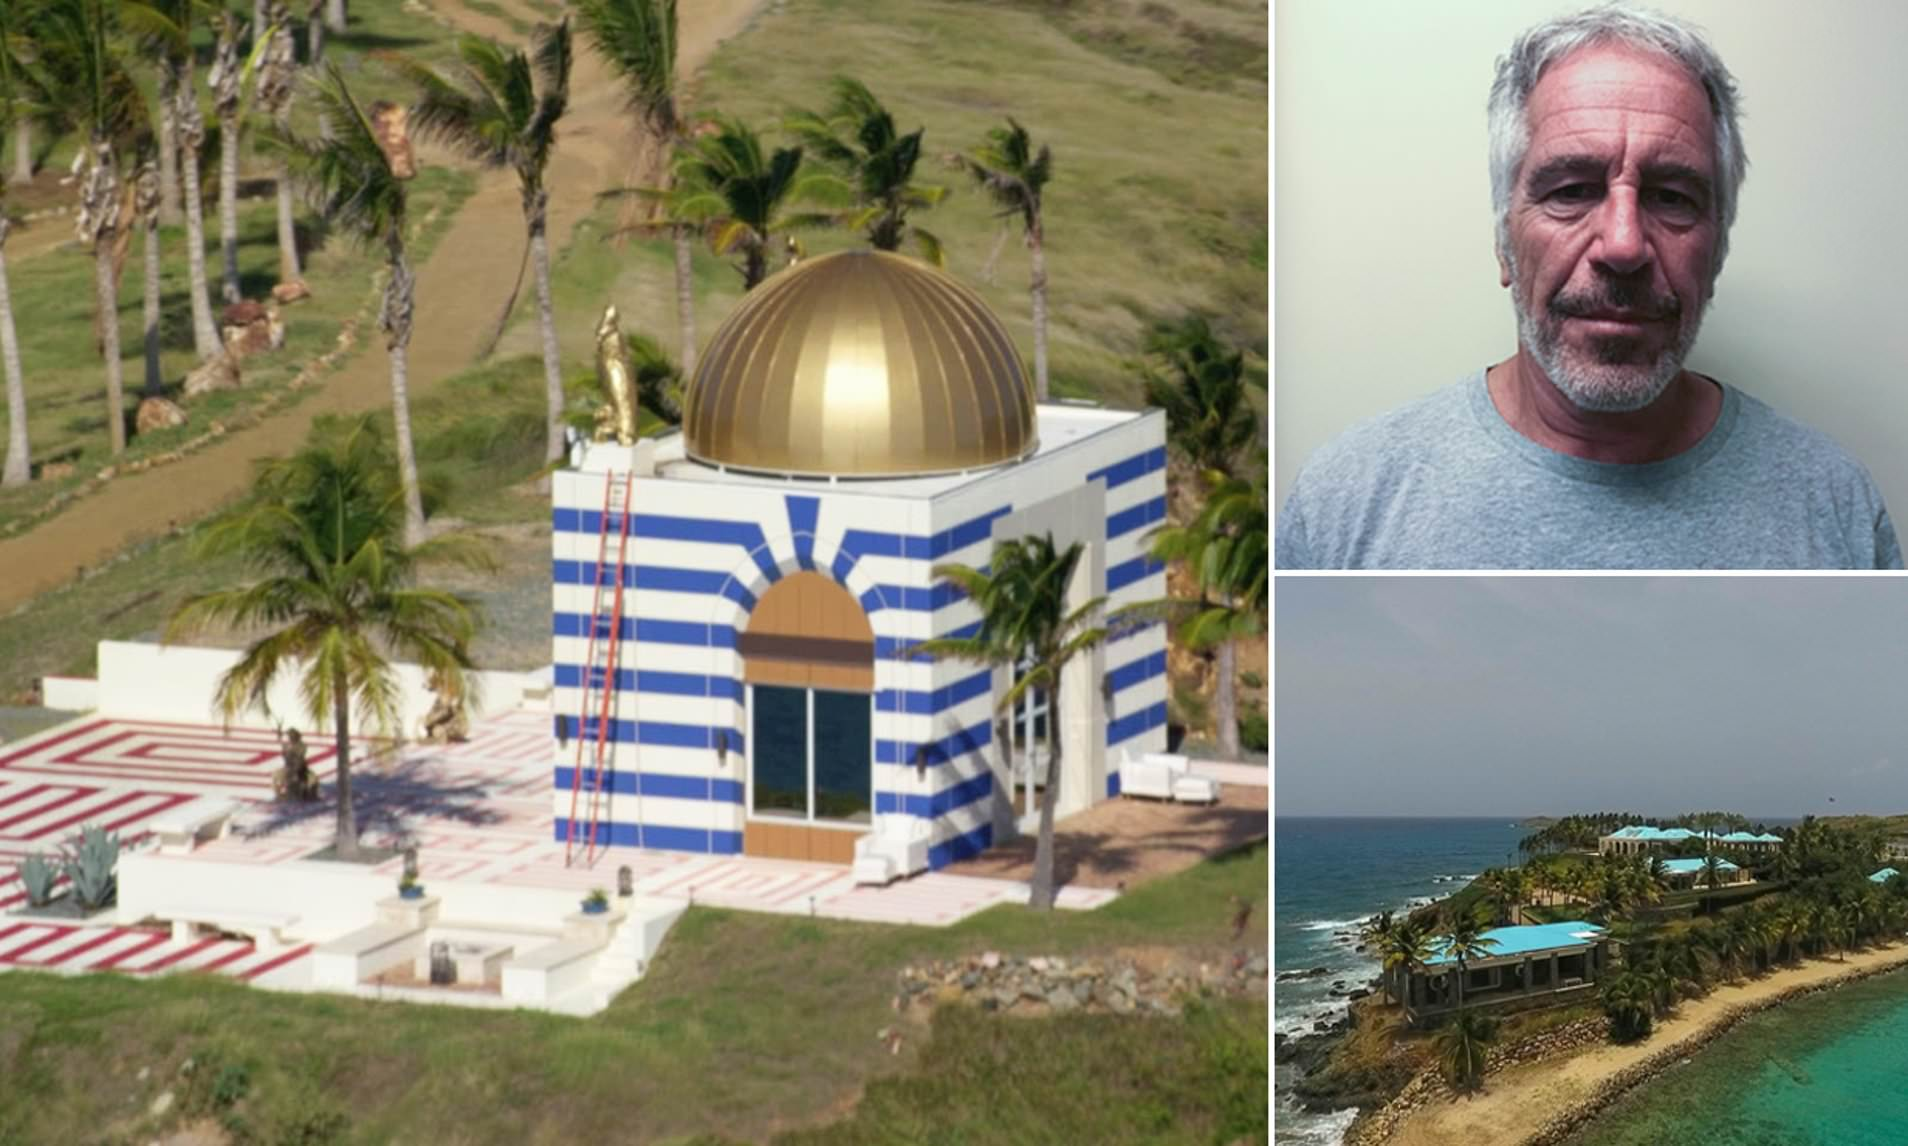 Exclusive Look Inside Epsteins Pedophile Island